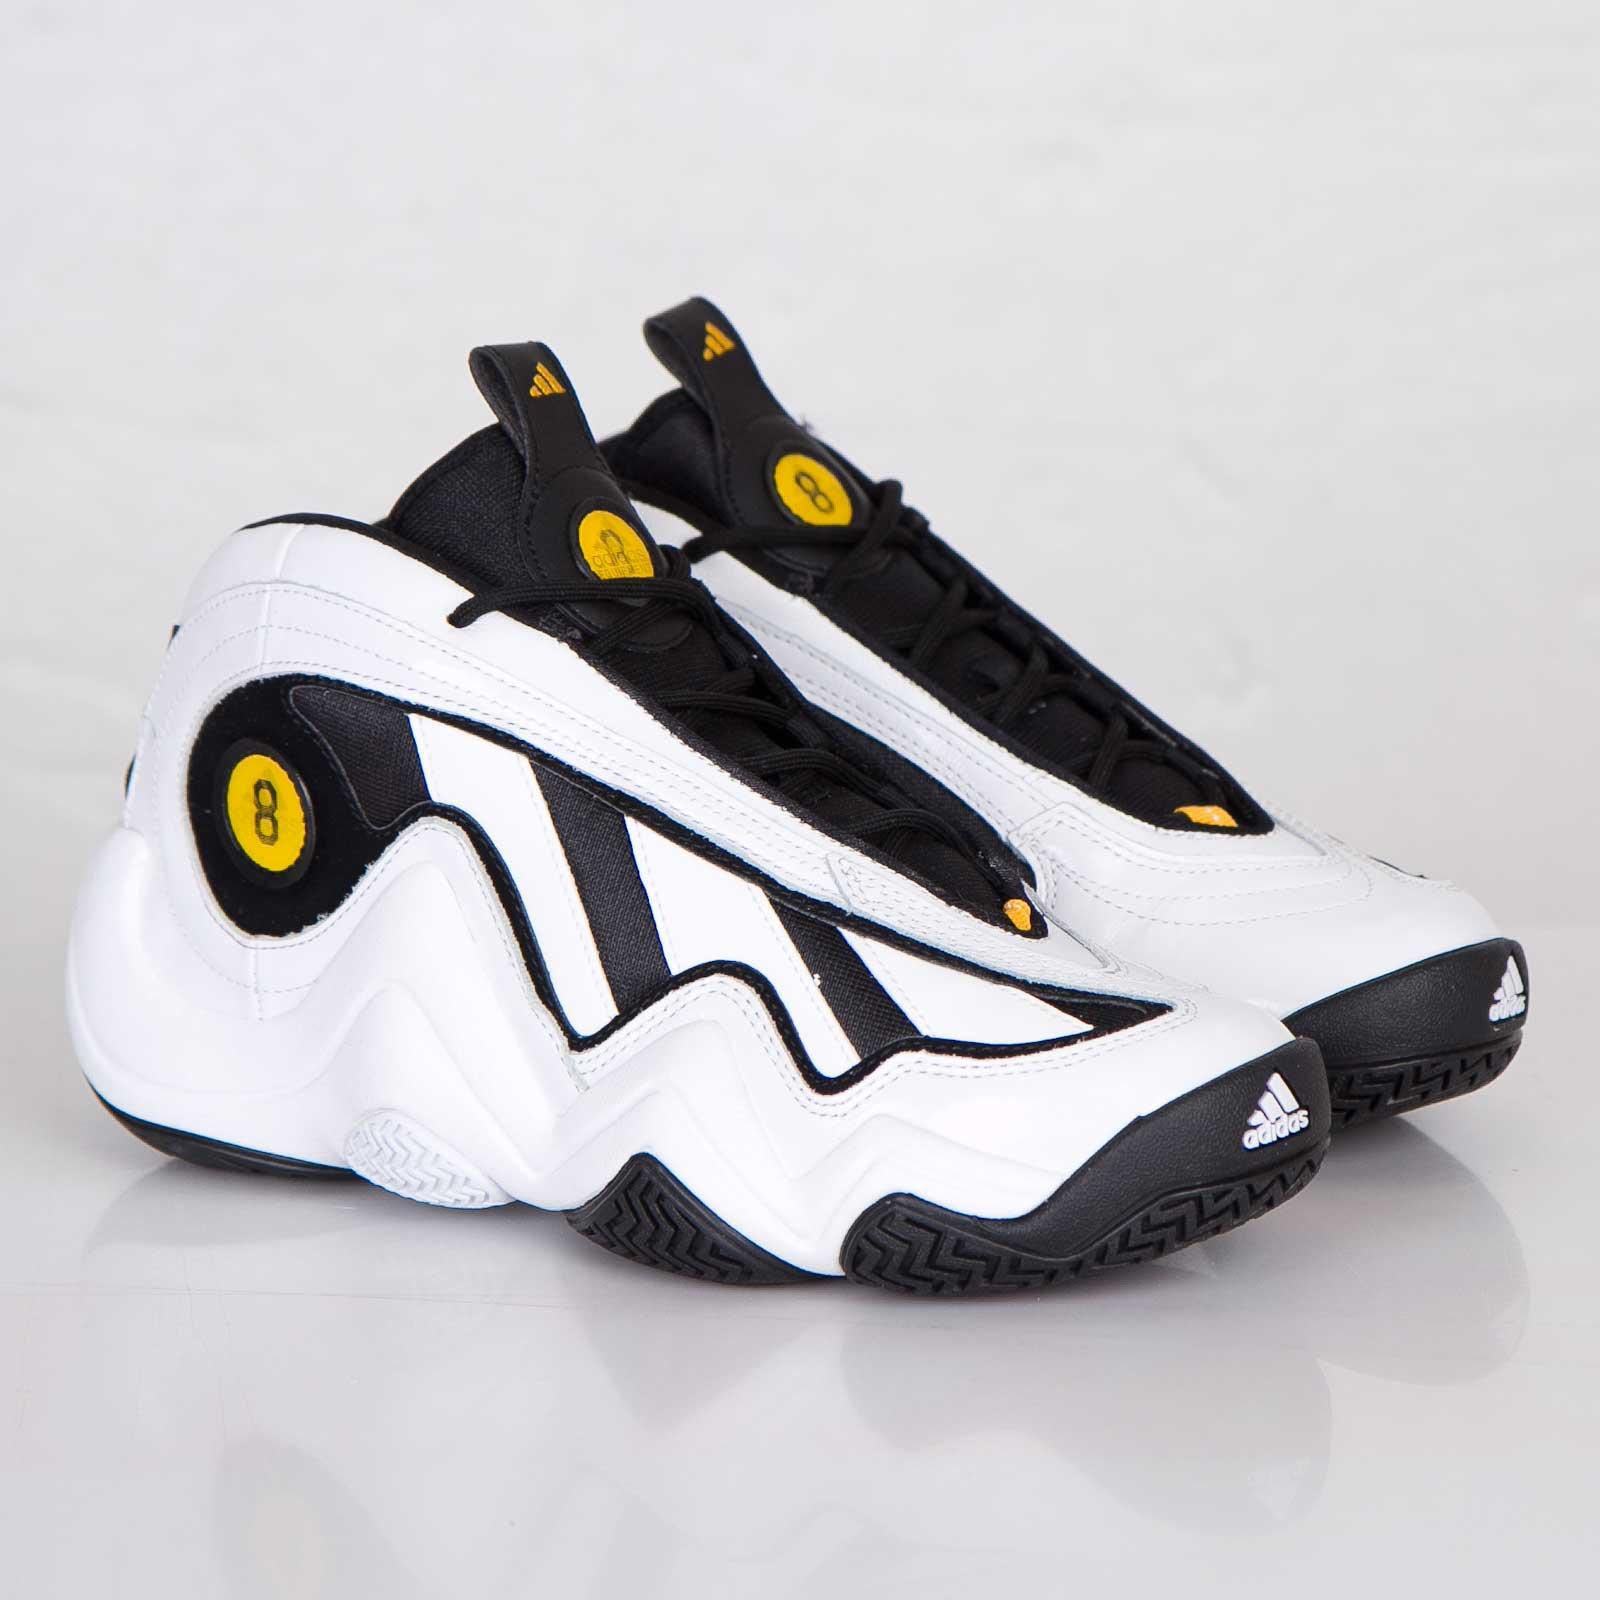 buy popular 9cf20 a1ff2 adidas Crazy 97 - M22543 - Sneakersnstuff  Sneaker  Streetwe